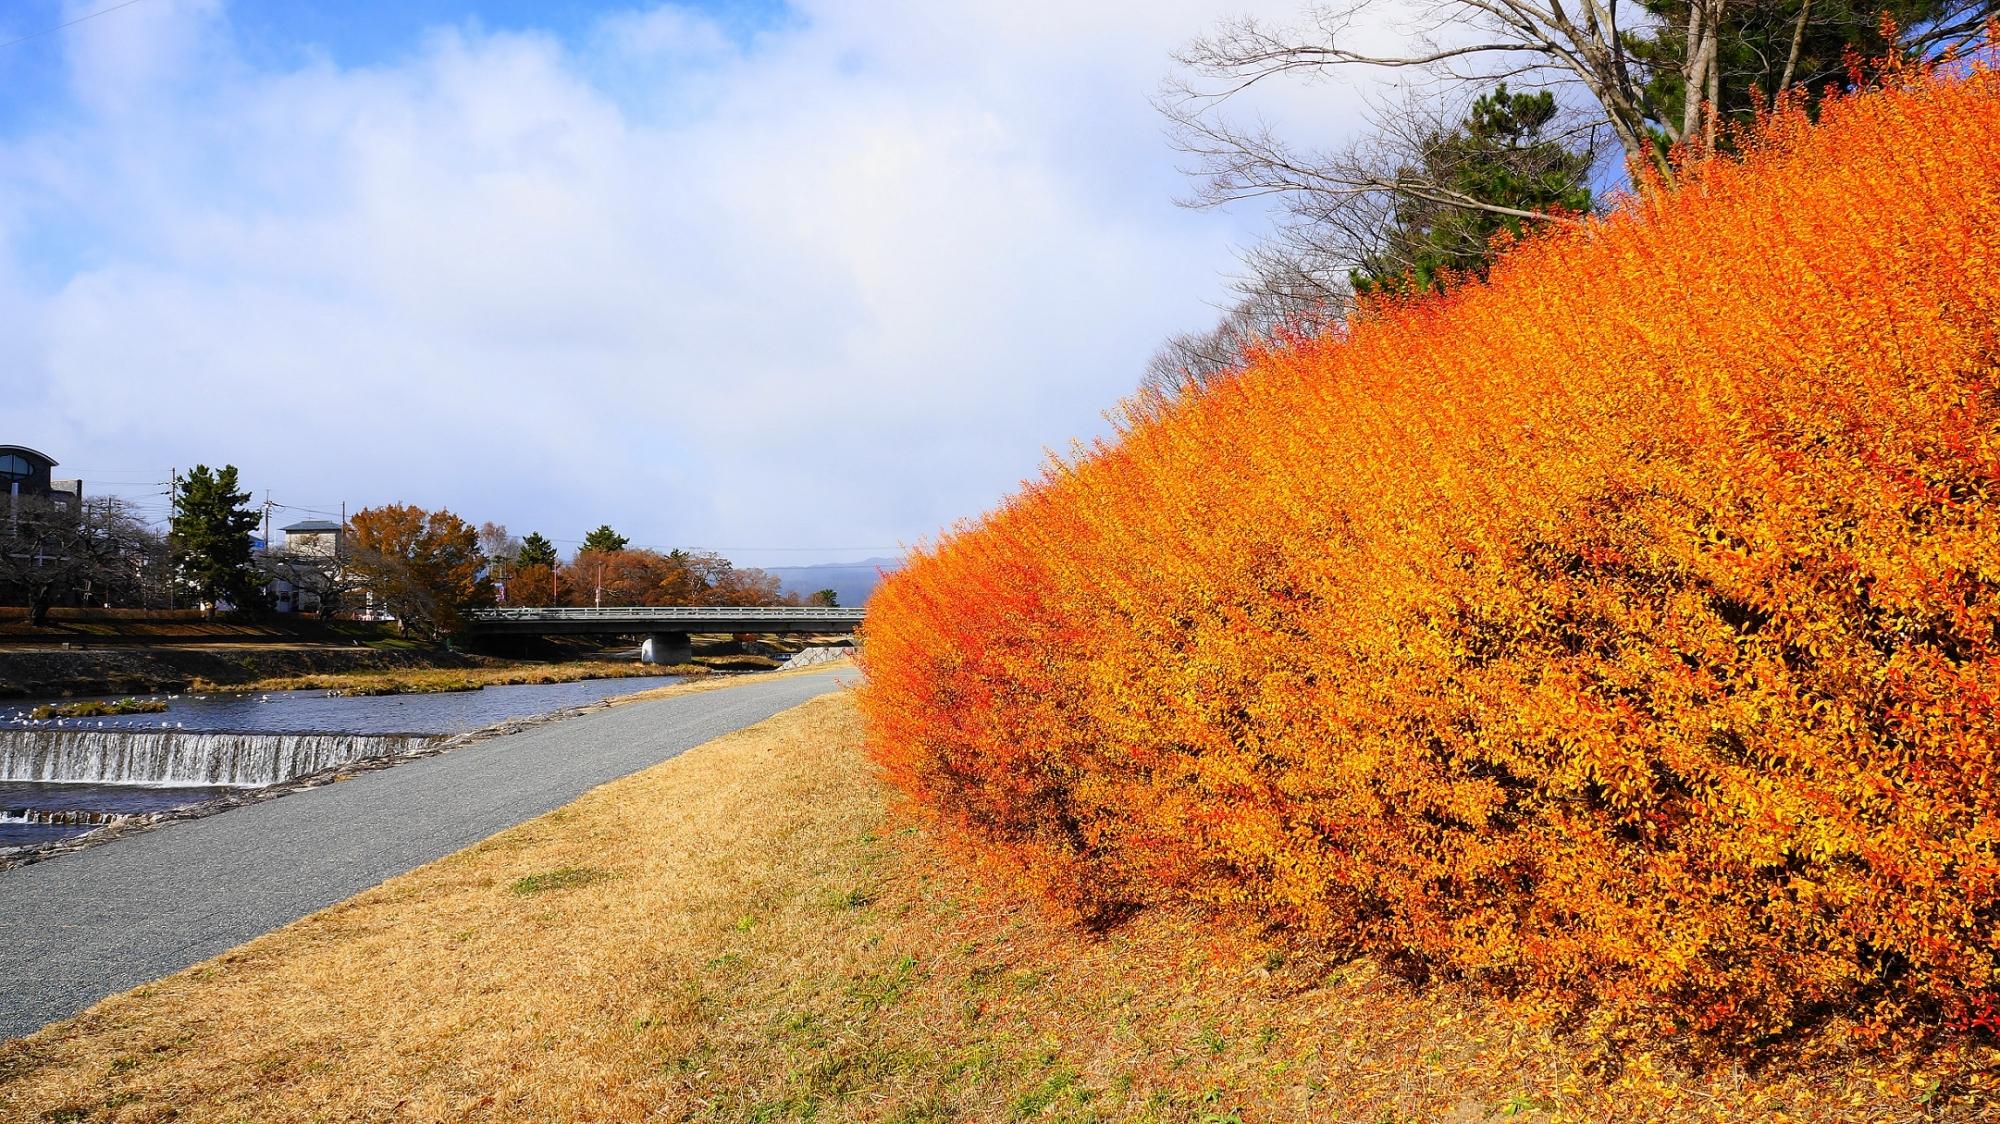 鴨川 冬 雪柳 オレンジ 紅葉 出町橋付近